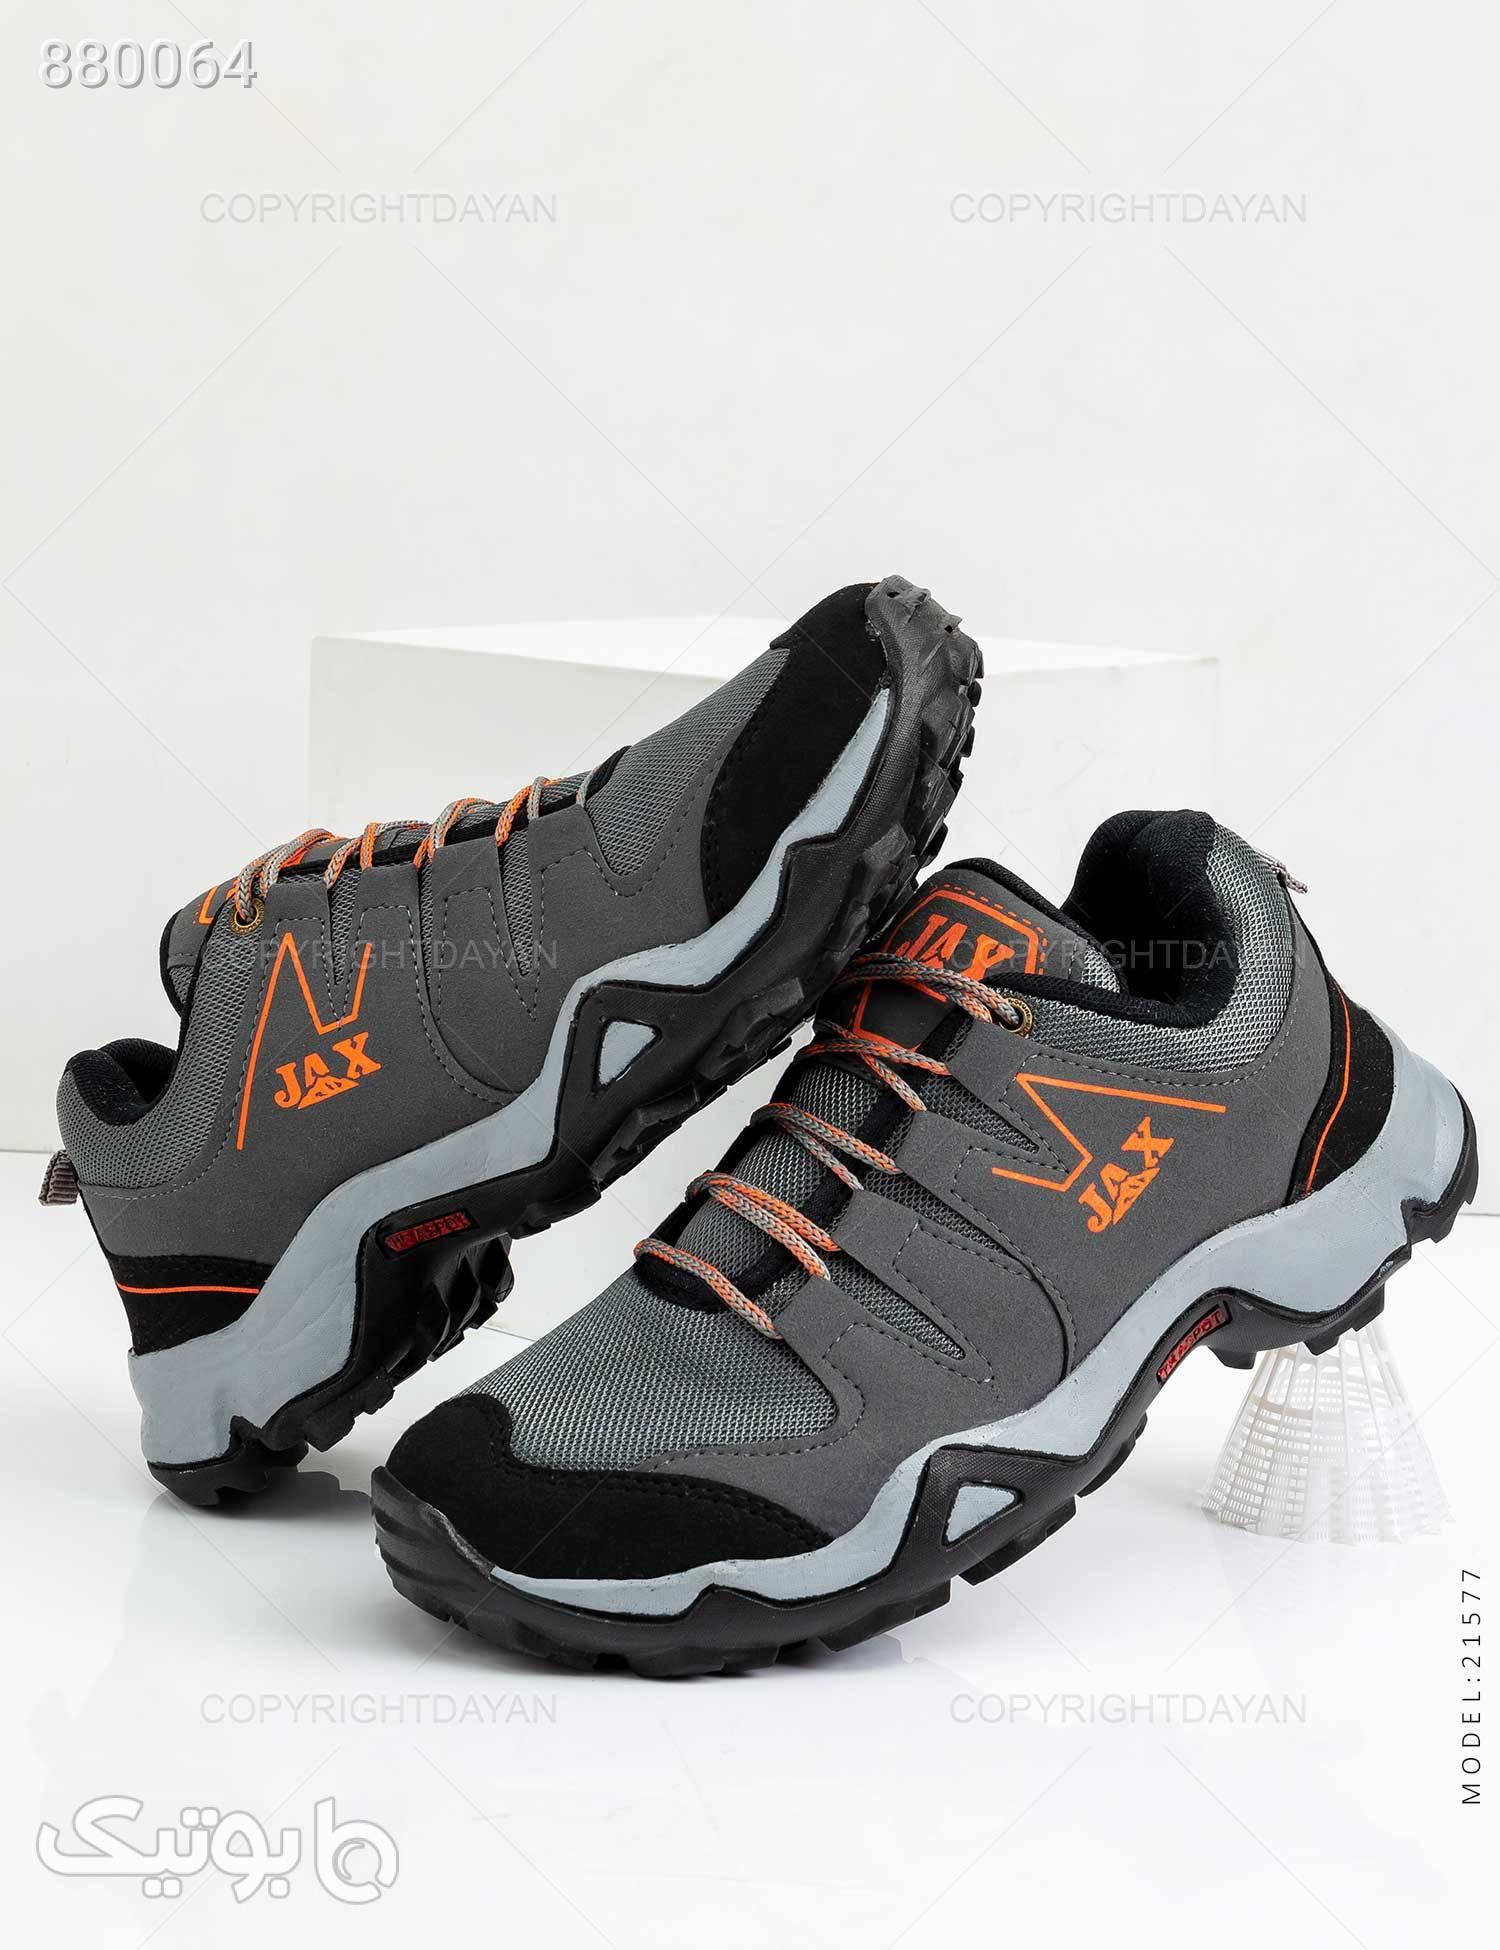 کفش ورزشی مردانه Jiaxiang مدل 21577 طوسی كتانی مردانه